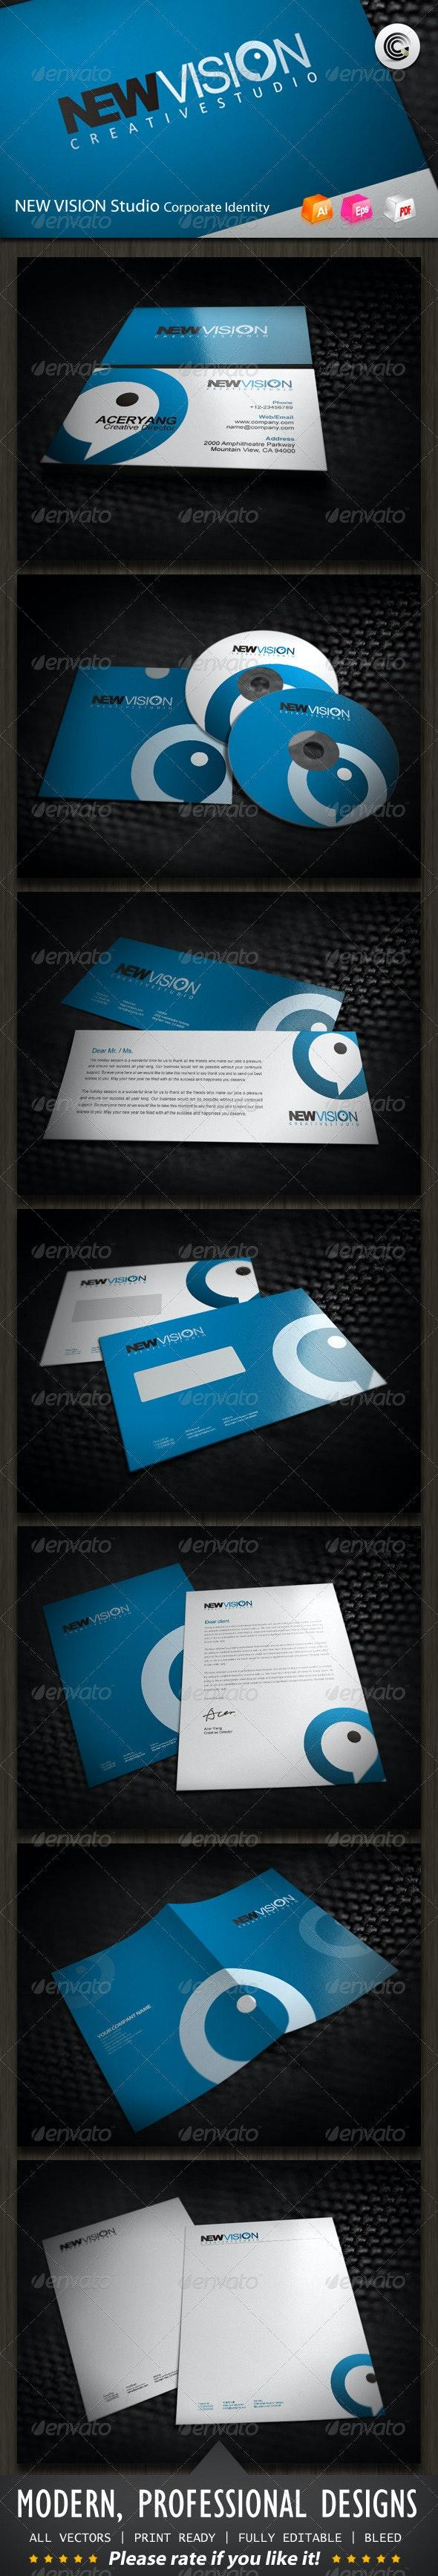 New Vision Studio Corporate Identity - Stationery Print Templates